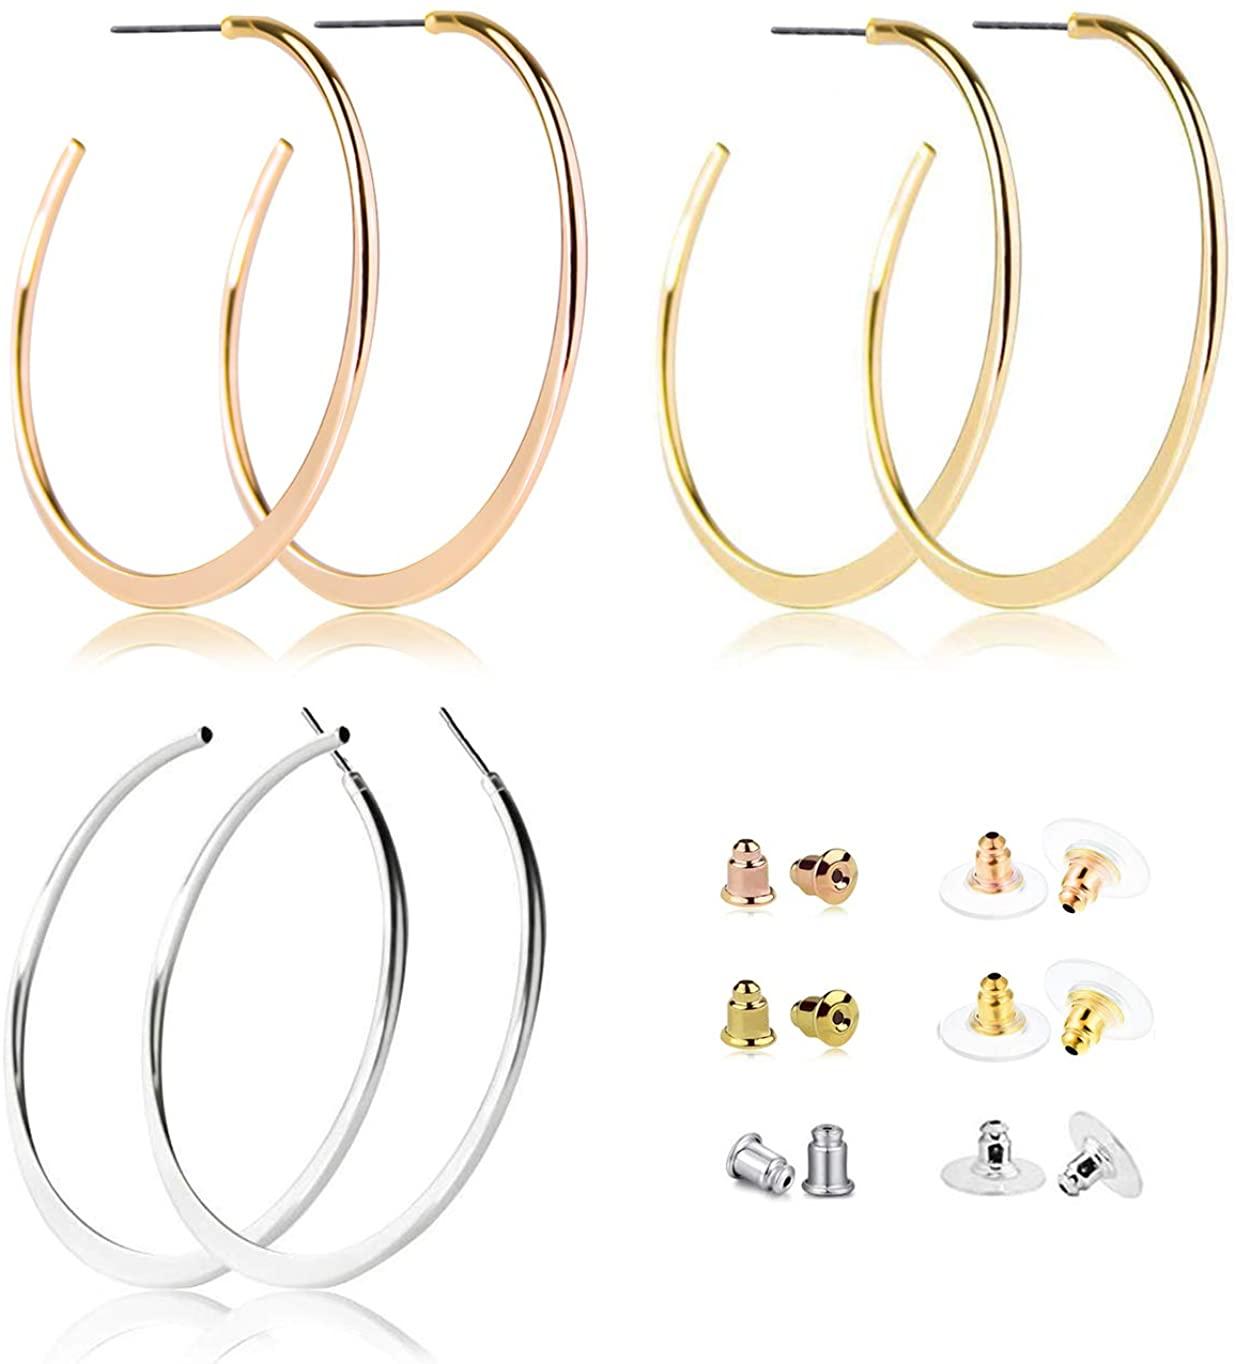 3 Pairs Big Hoop Earrings Stainless Steel Posts Flattened Hoop Earrings in Gold 10K Rose Gold Silver Plated for Women Girls 55mm Sensitive Hypoallergenic